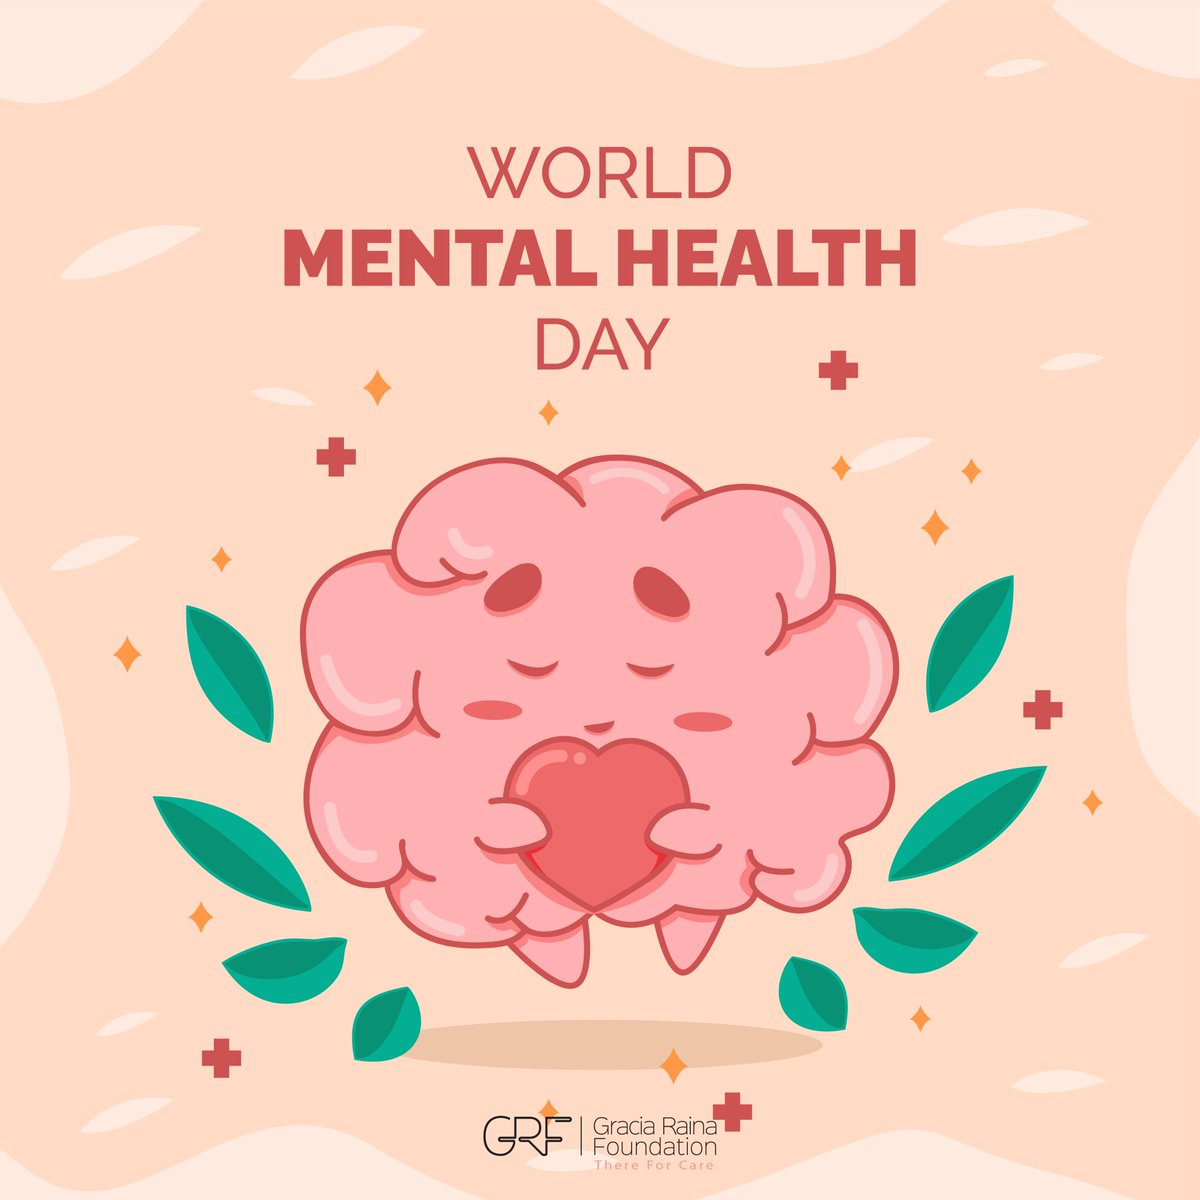 #worldmentalhealthday2020  #mentalhealthawareness